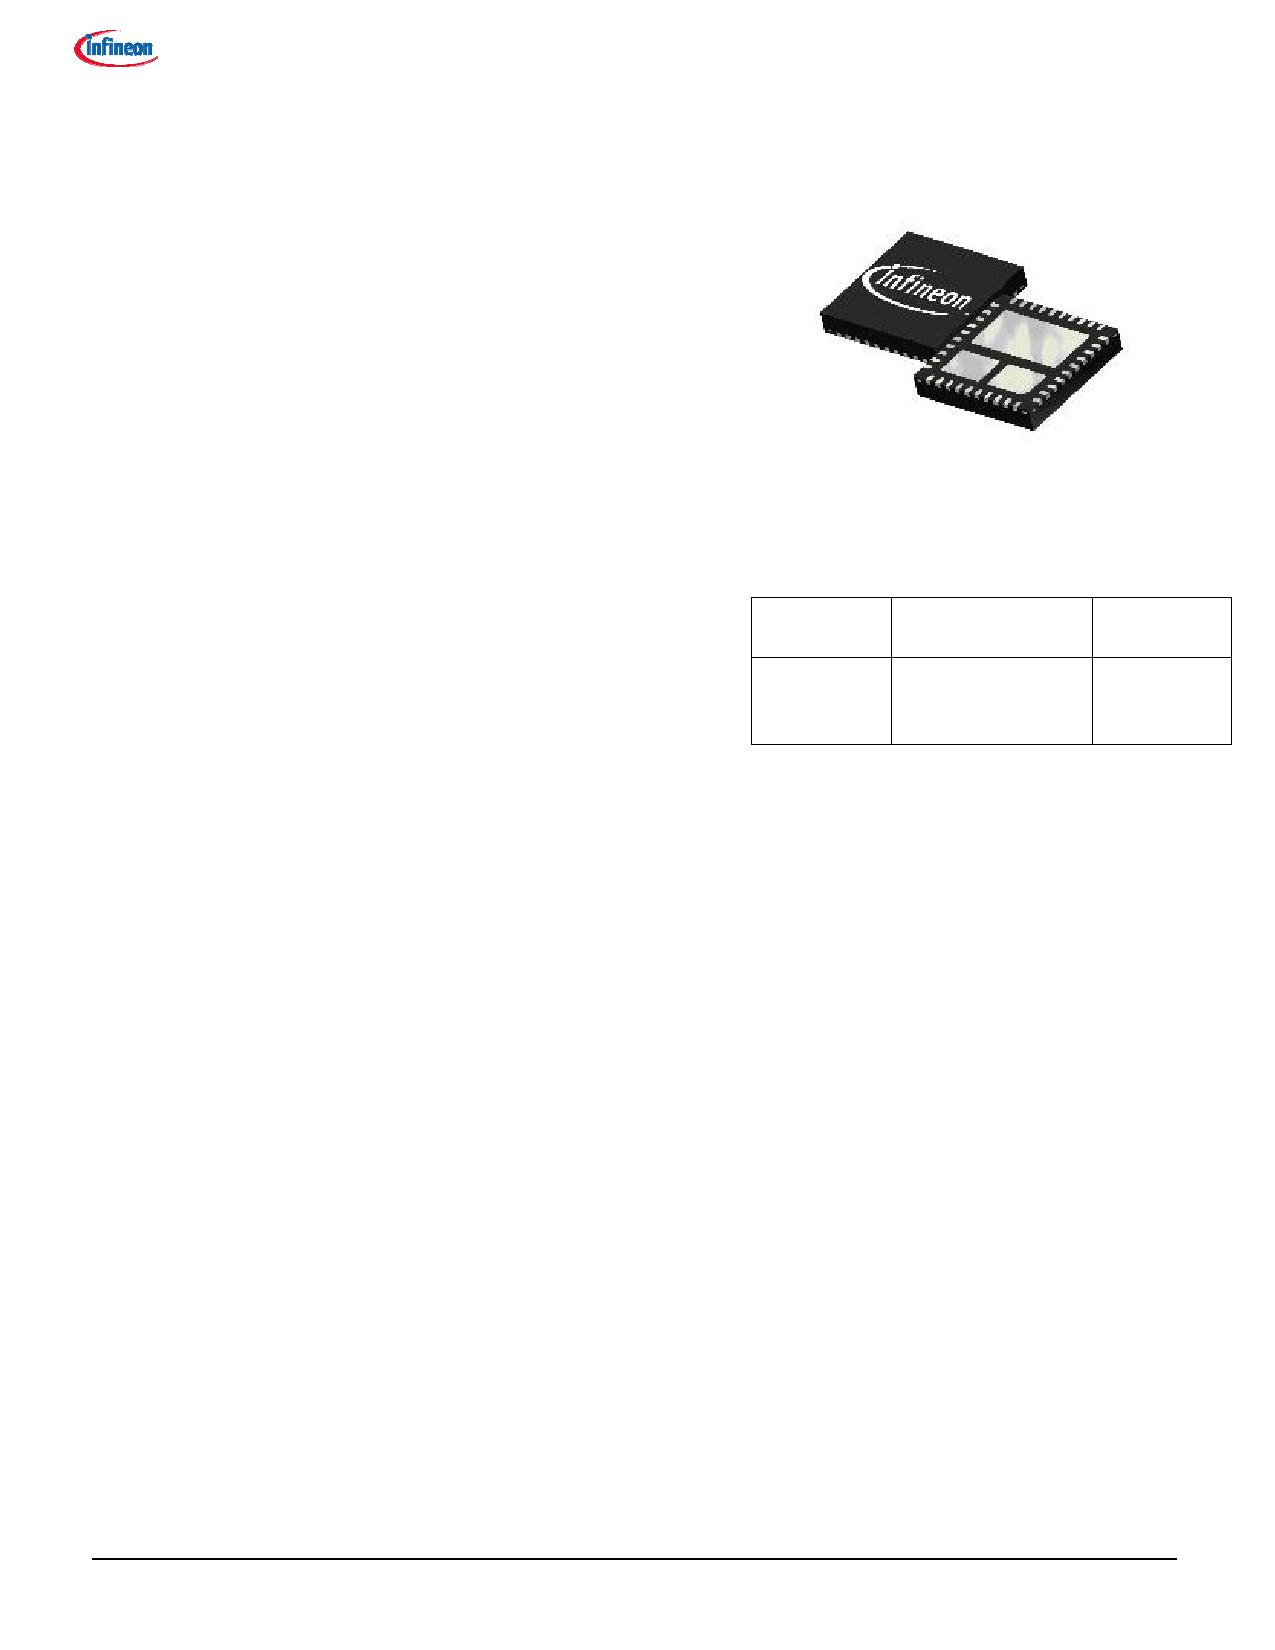 TDA21211 pdf, equivalent, schematic